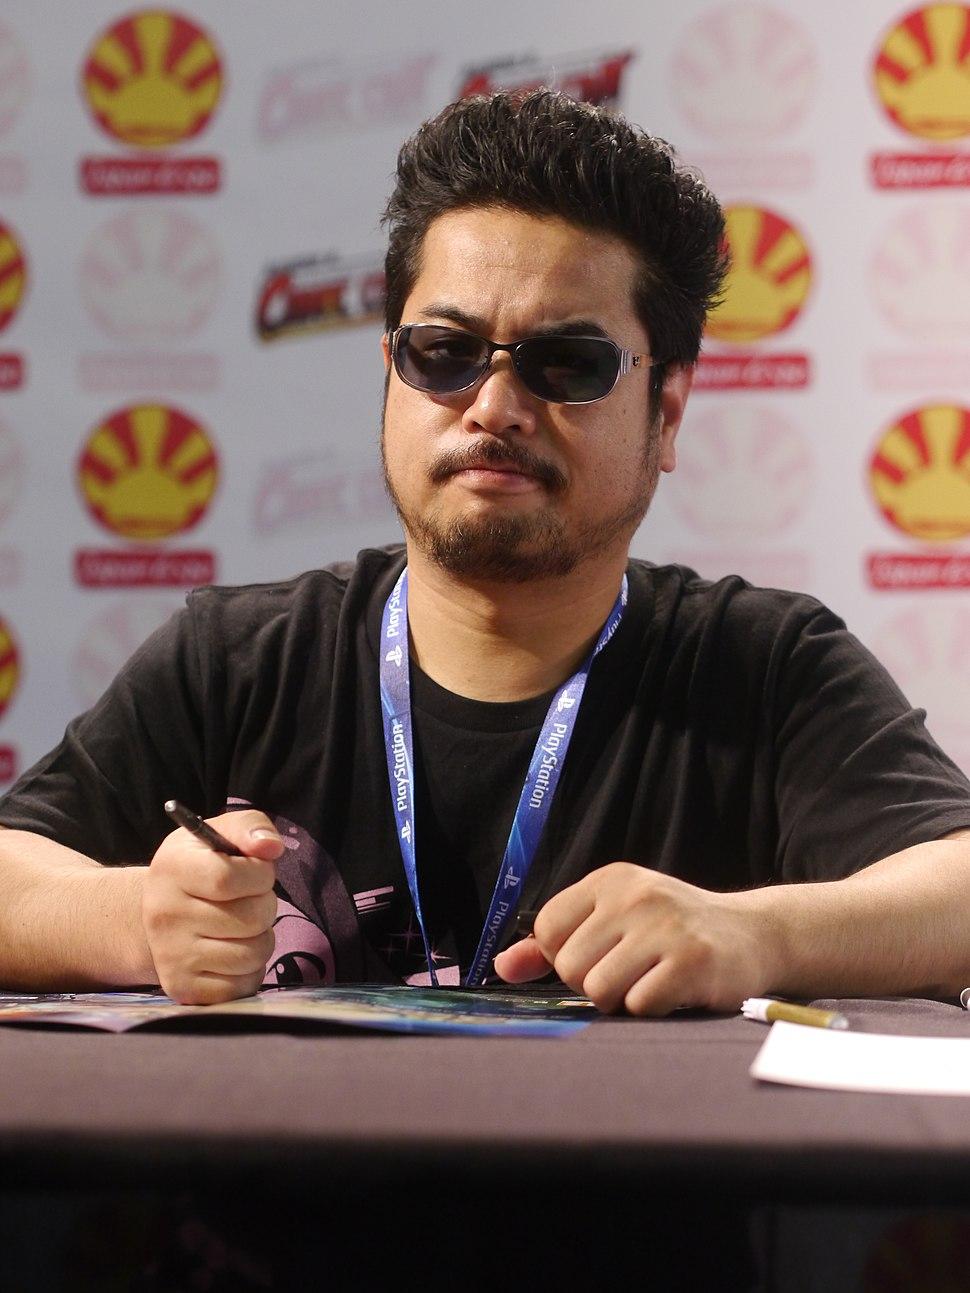 Katsuhiro Harada - Samedi - Japan Expo 2013 - P1670076